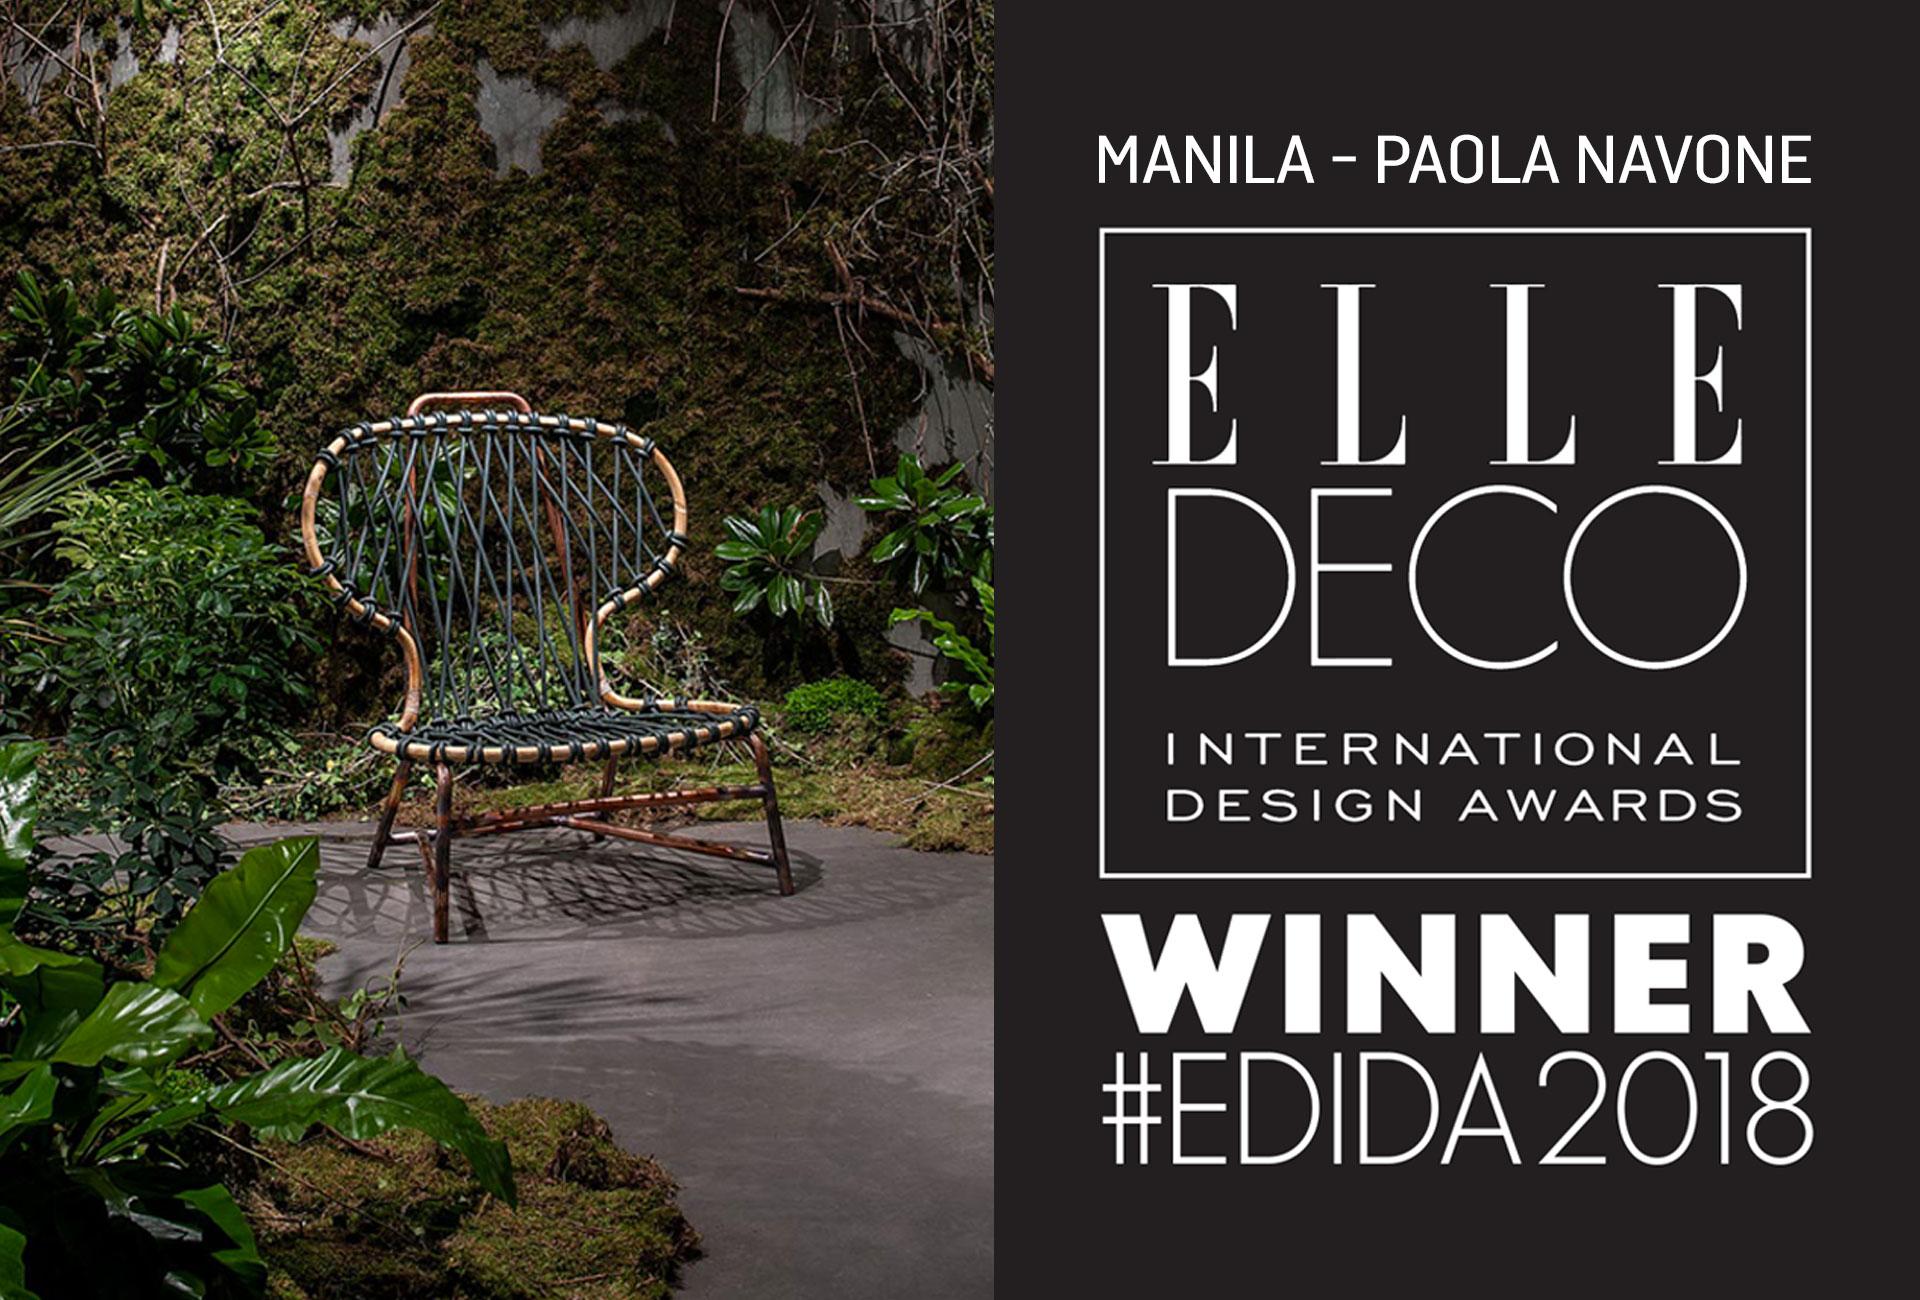 MANILA VIENE PREMIATA DAGLI ELLE DECO INTERNATIONAL DESIGN AWARDS